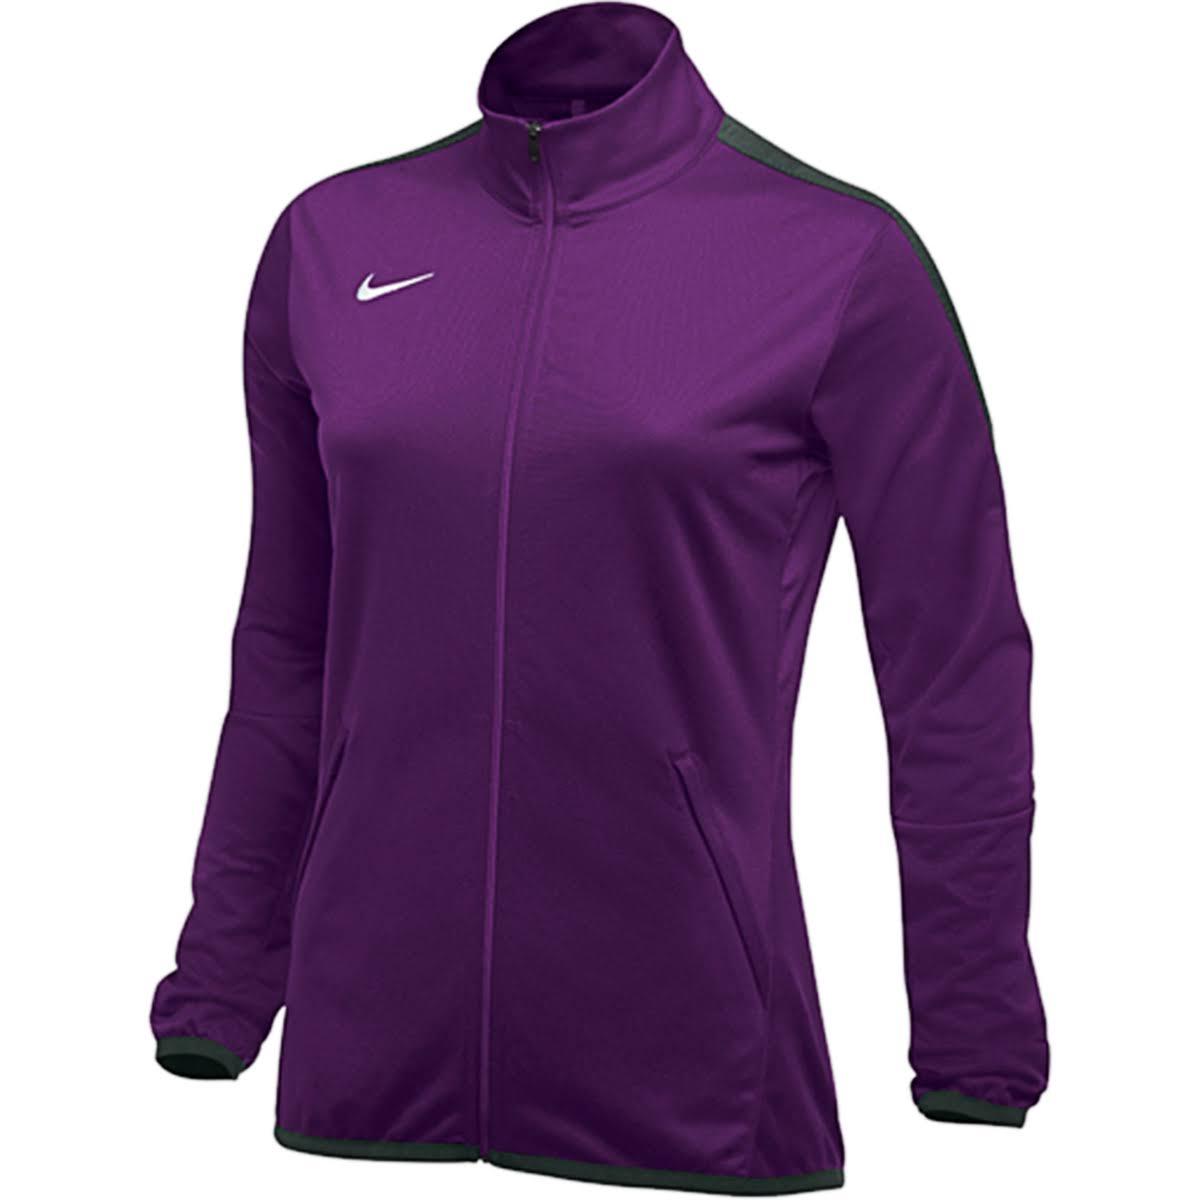 Blanc Nike Femme Violet 836119552 Team Anthracite Epic Jacket BBwHYq